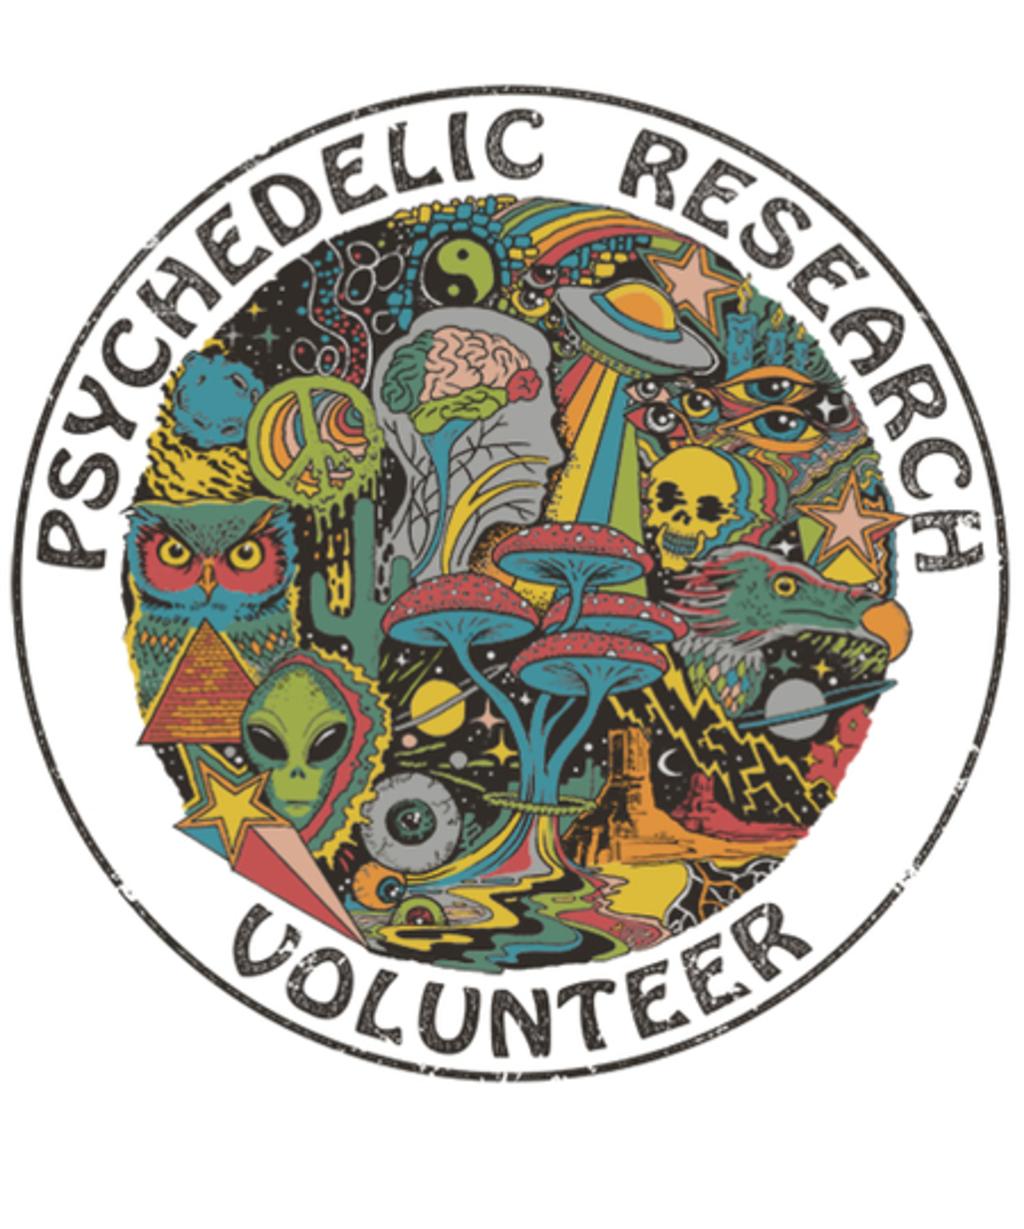 Qwertee: Psychedelic Research Volunteer